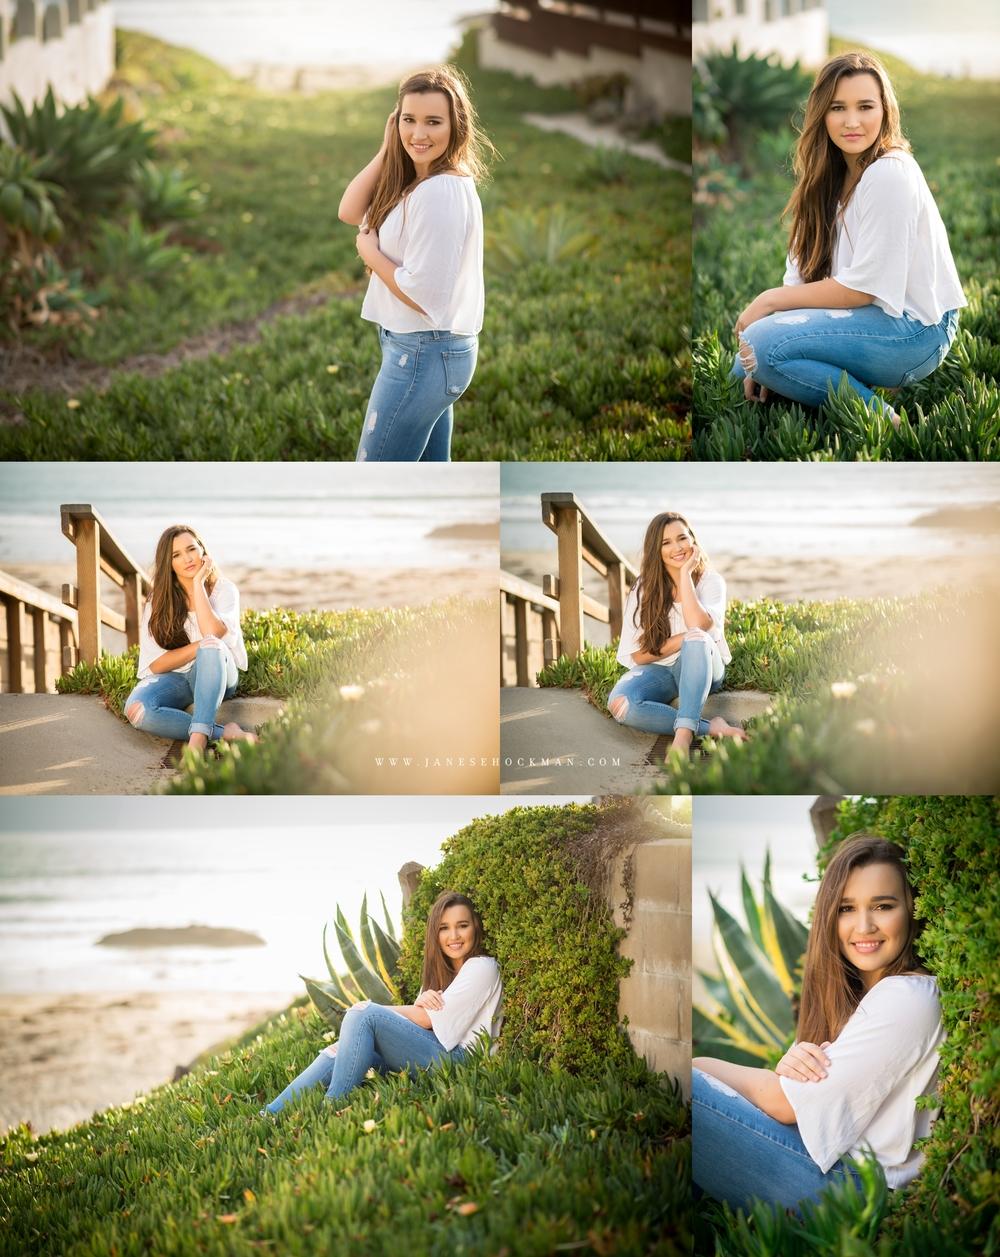 Tatum | Janese Hockman Photography | High School Senior Portraits | San Luis Obispo, California 4.jpg